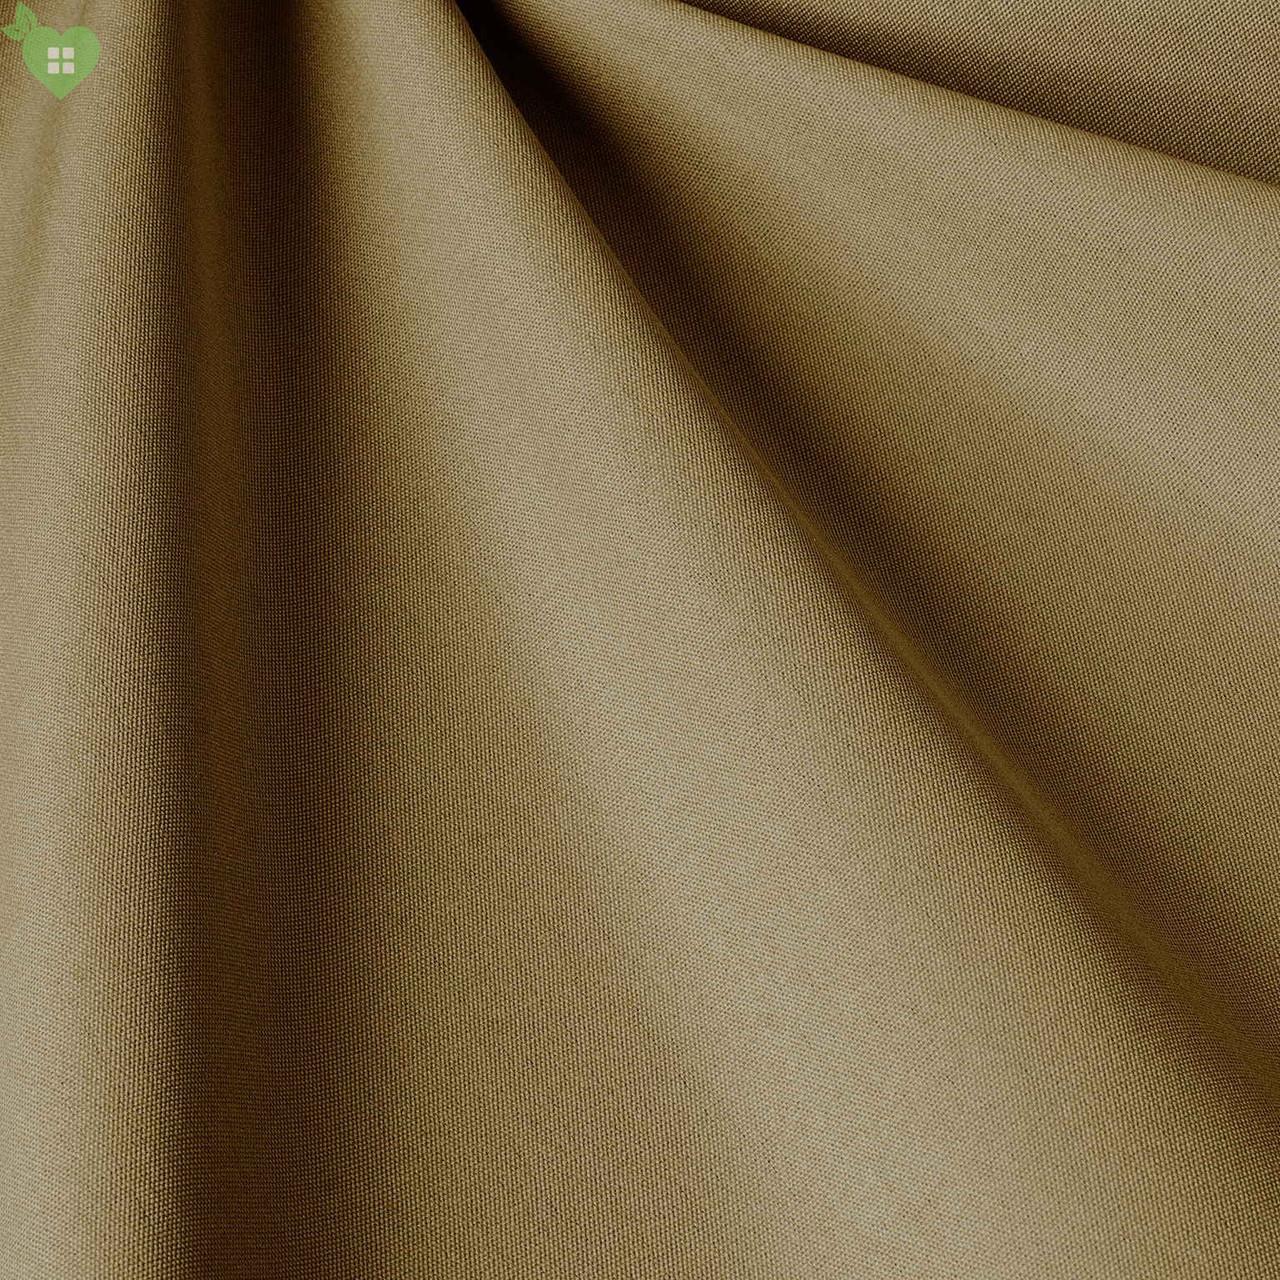 Ткань для улицы: Дралон (Outdoor) 83386v14